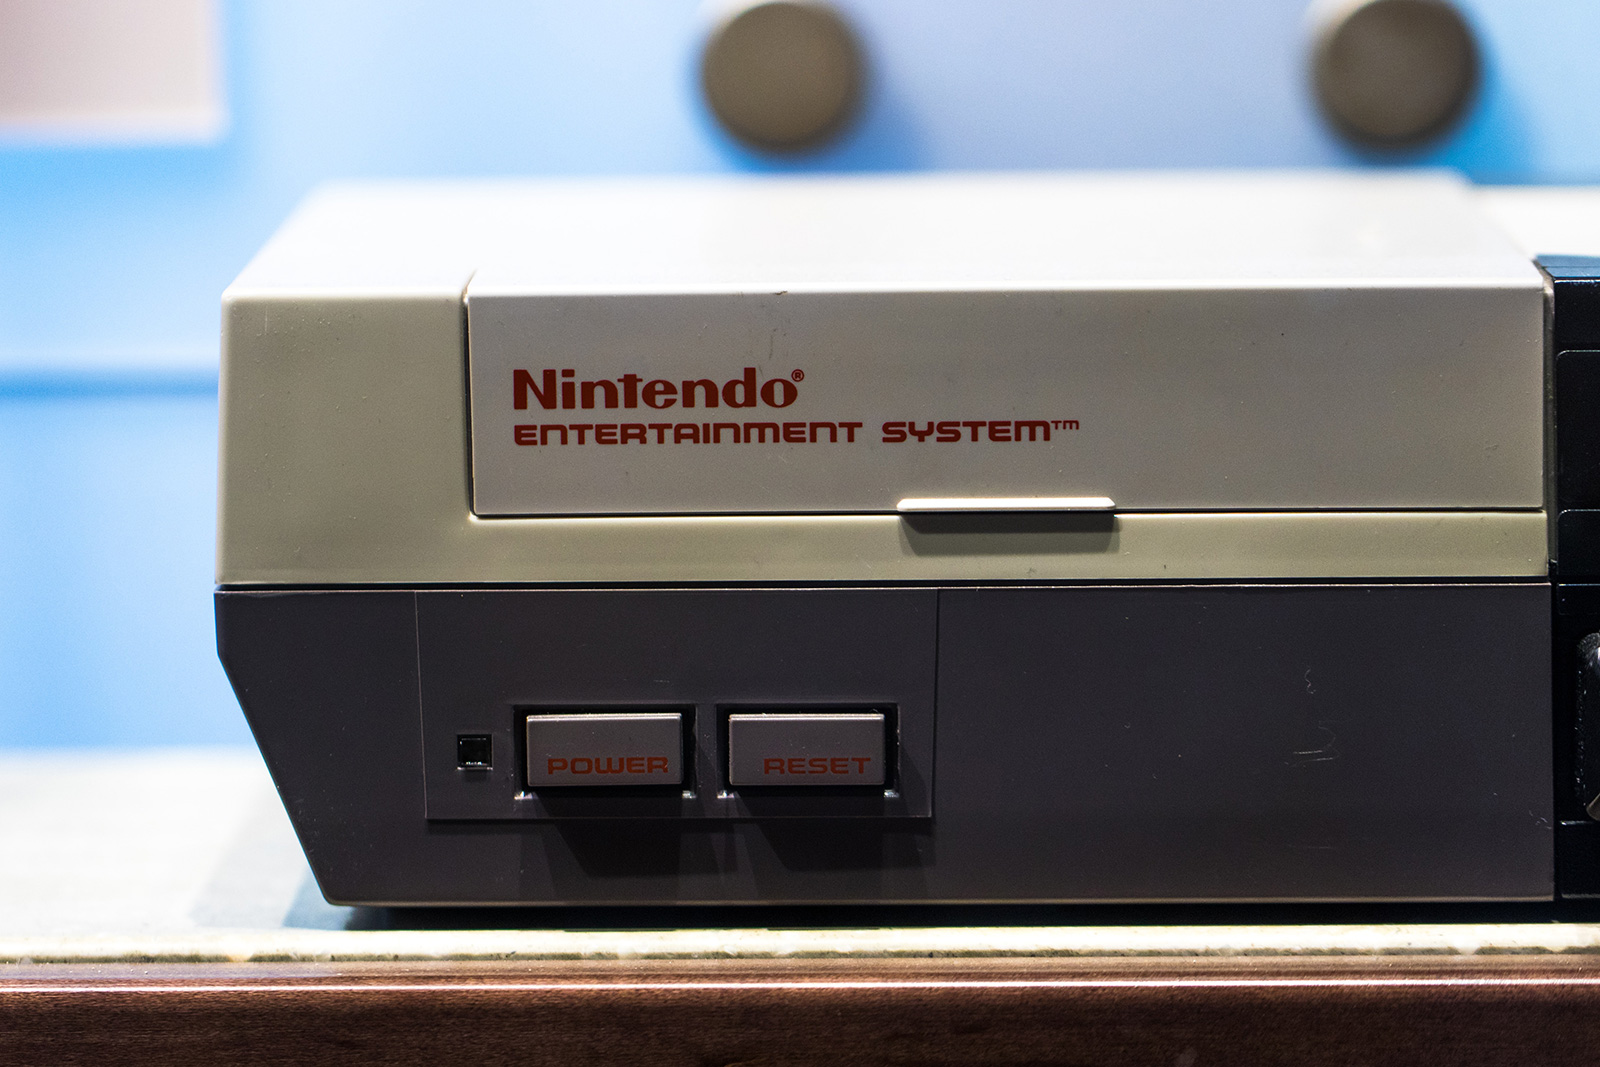 NES game console